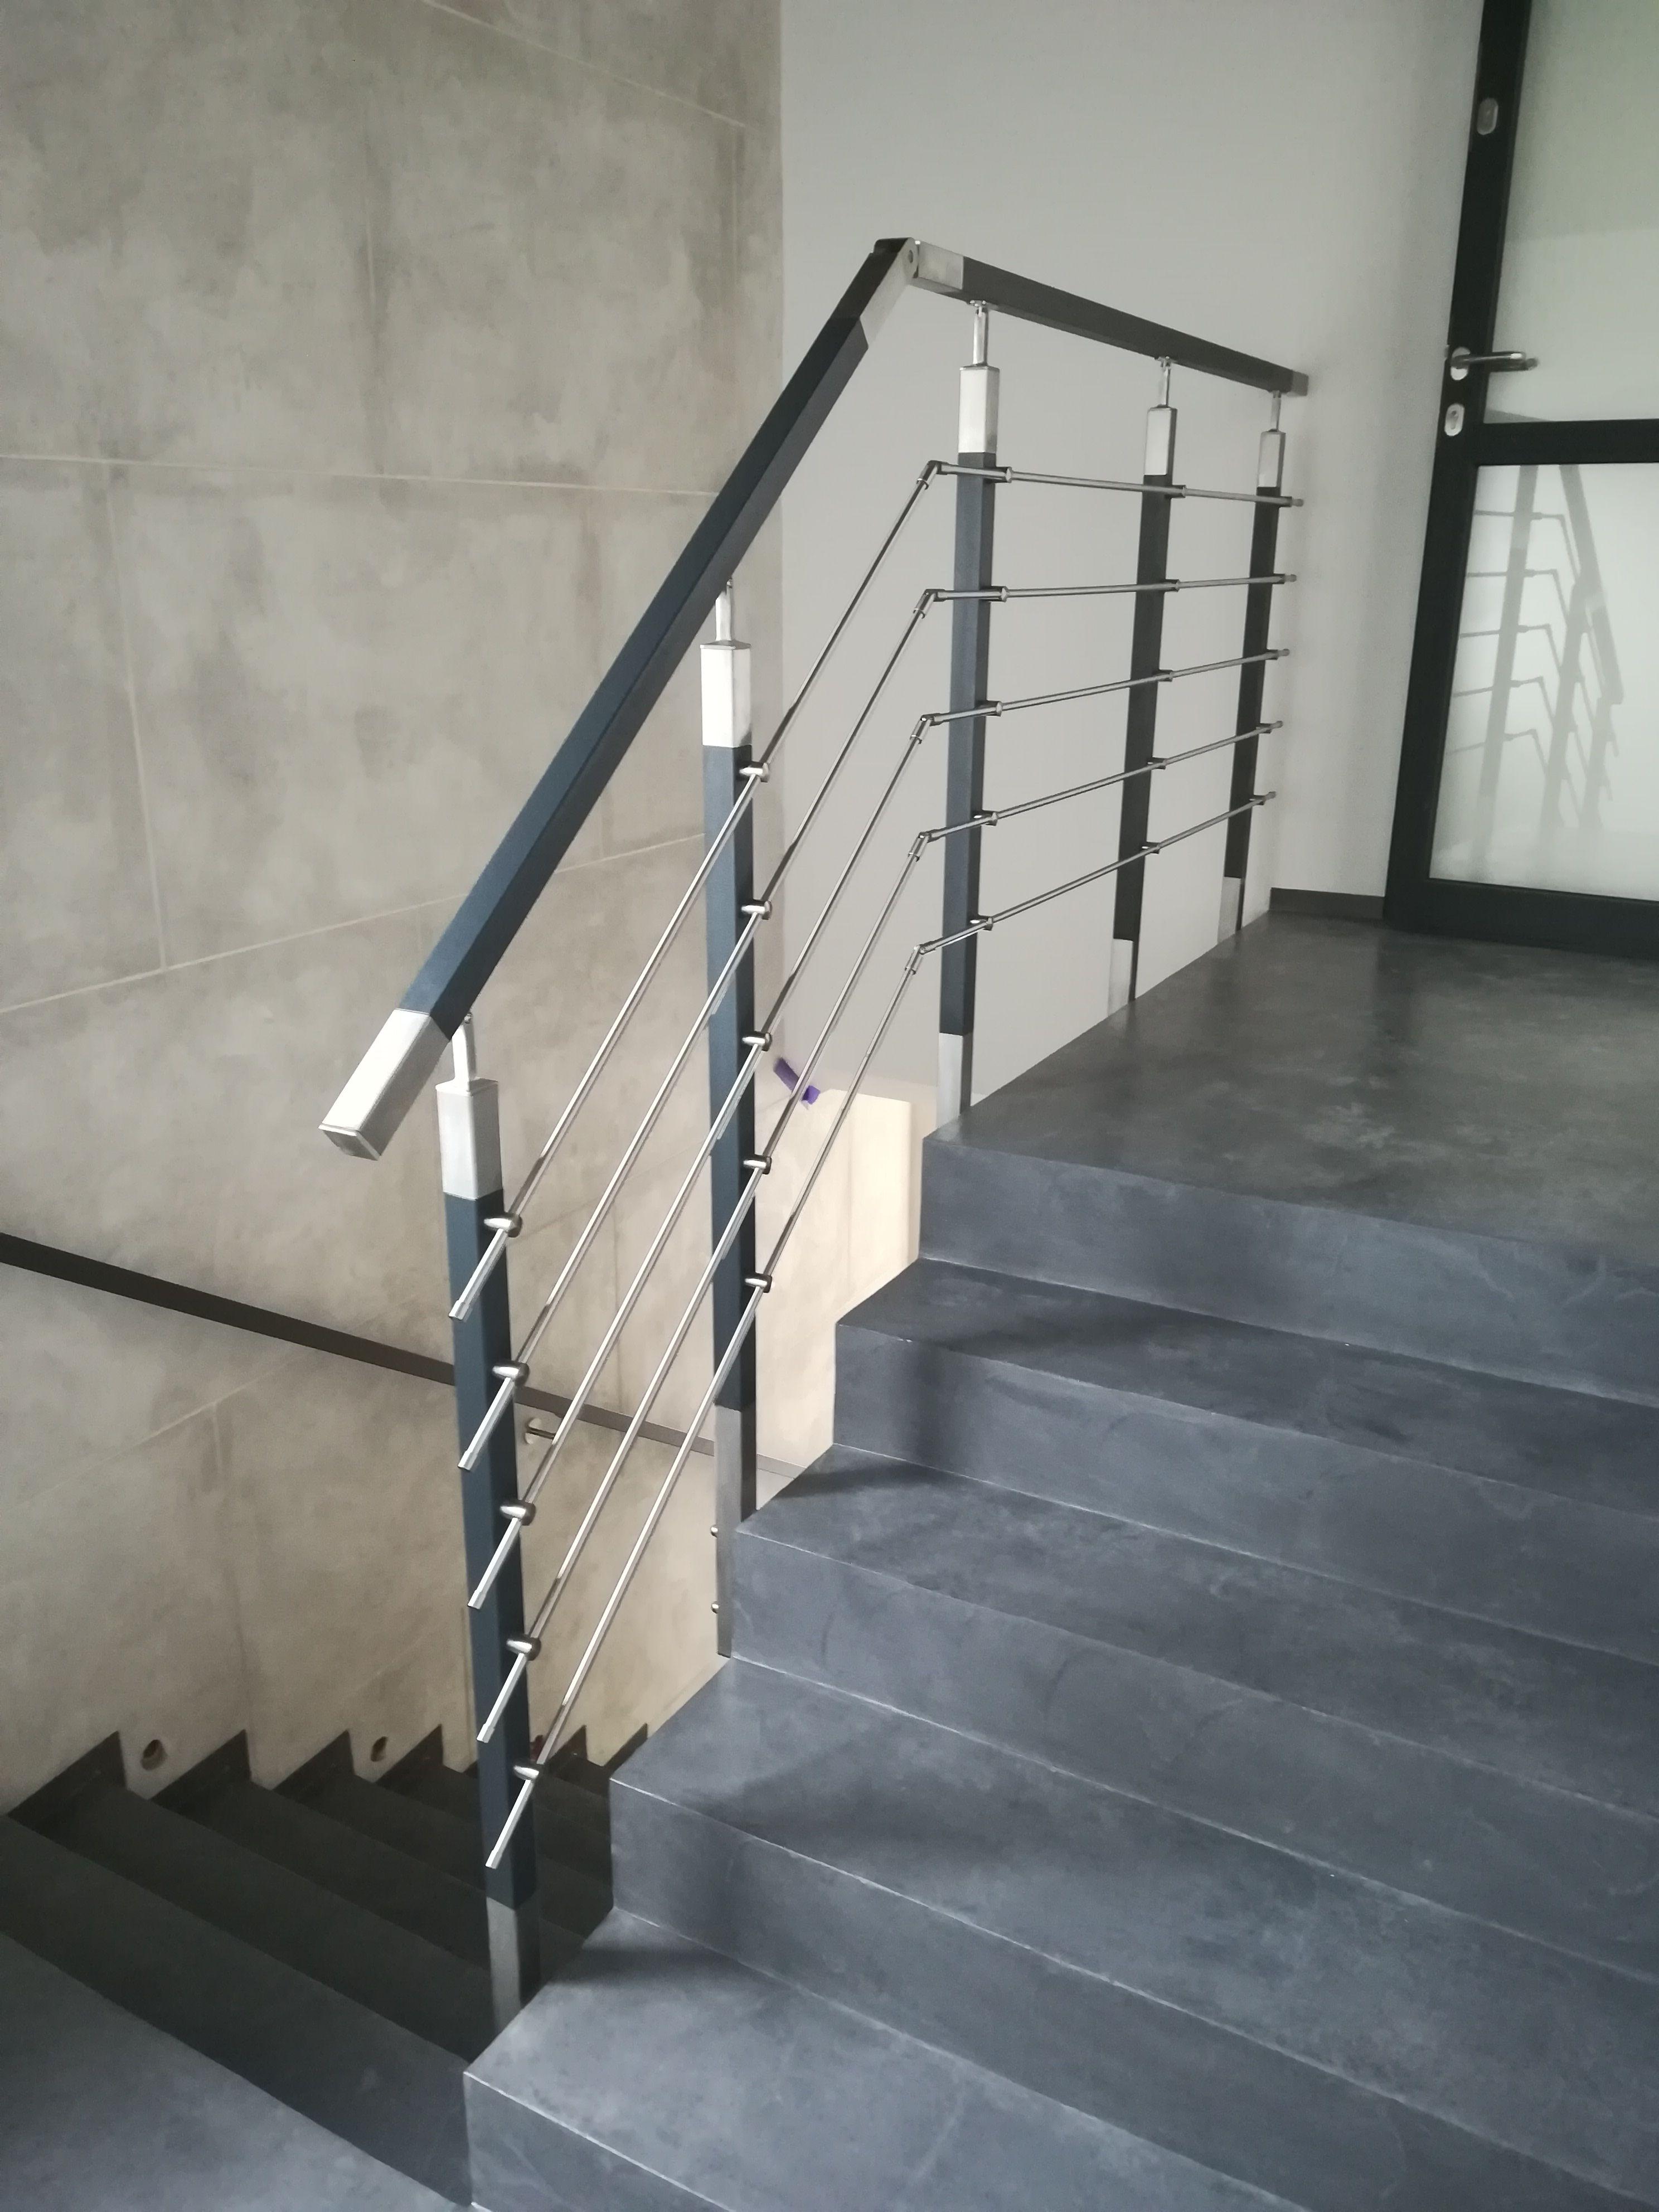 Balustrada Wewnetrzna Barierka Balustrade Handrail Stairs Door Modern Building Stainless Steel Stairs Modern Buildings Handrail